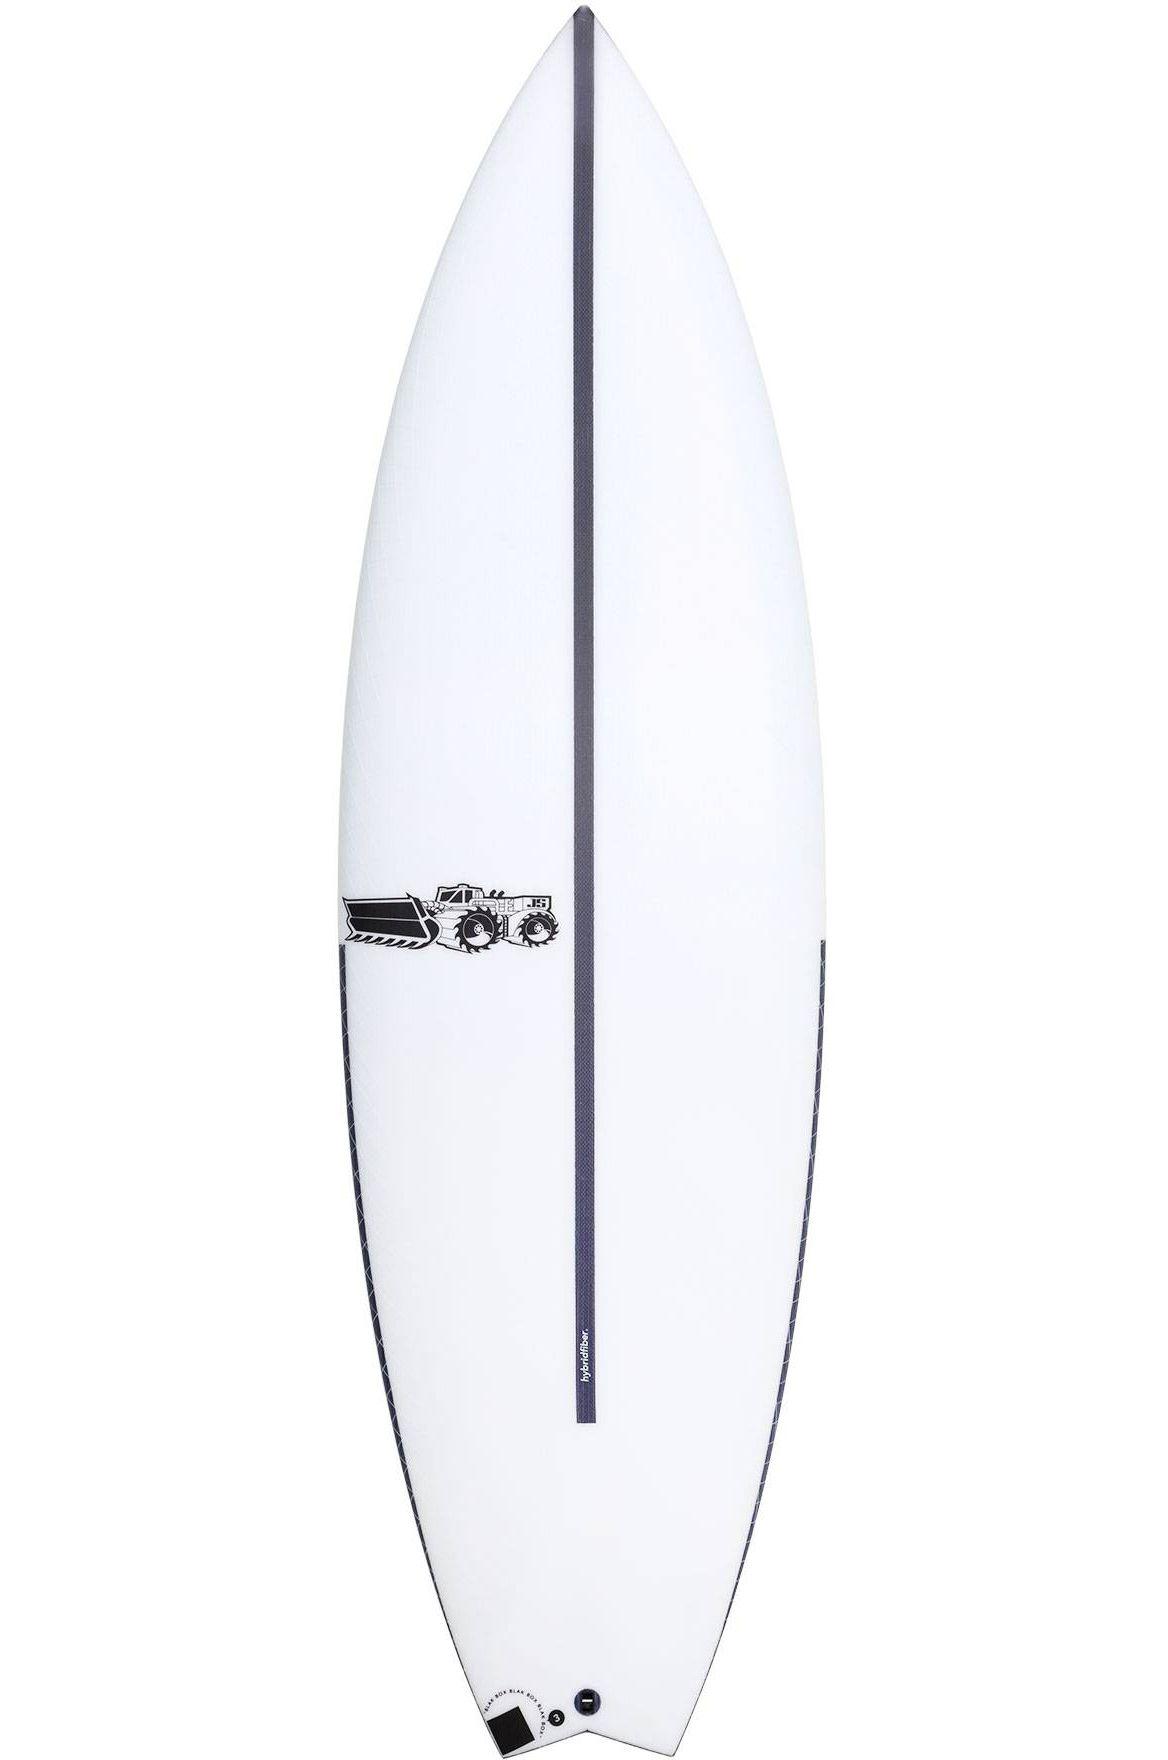 Prancha Surf JS 6'1 BLAK BOX 3 HYFI Swallow Tail - Color FCS II Multisystem 6ft1